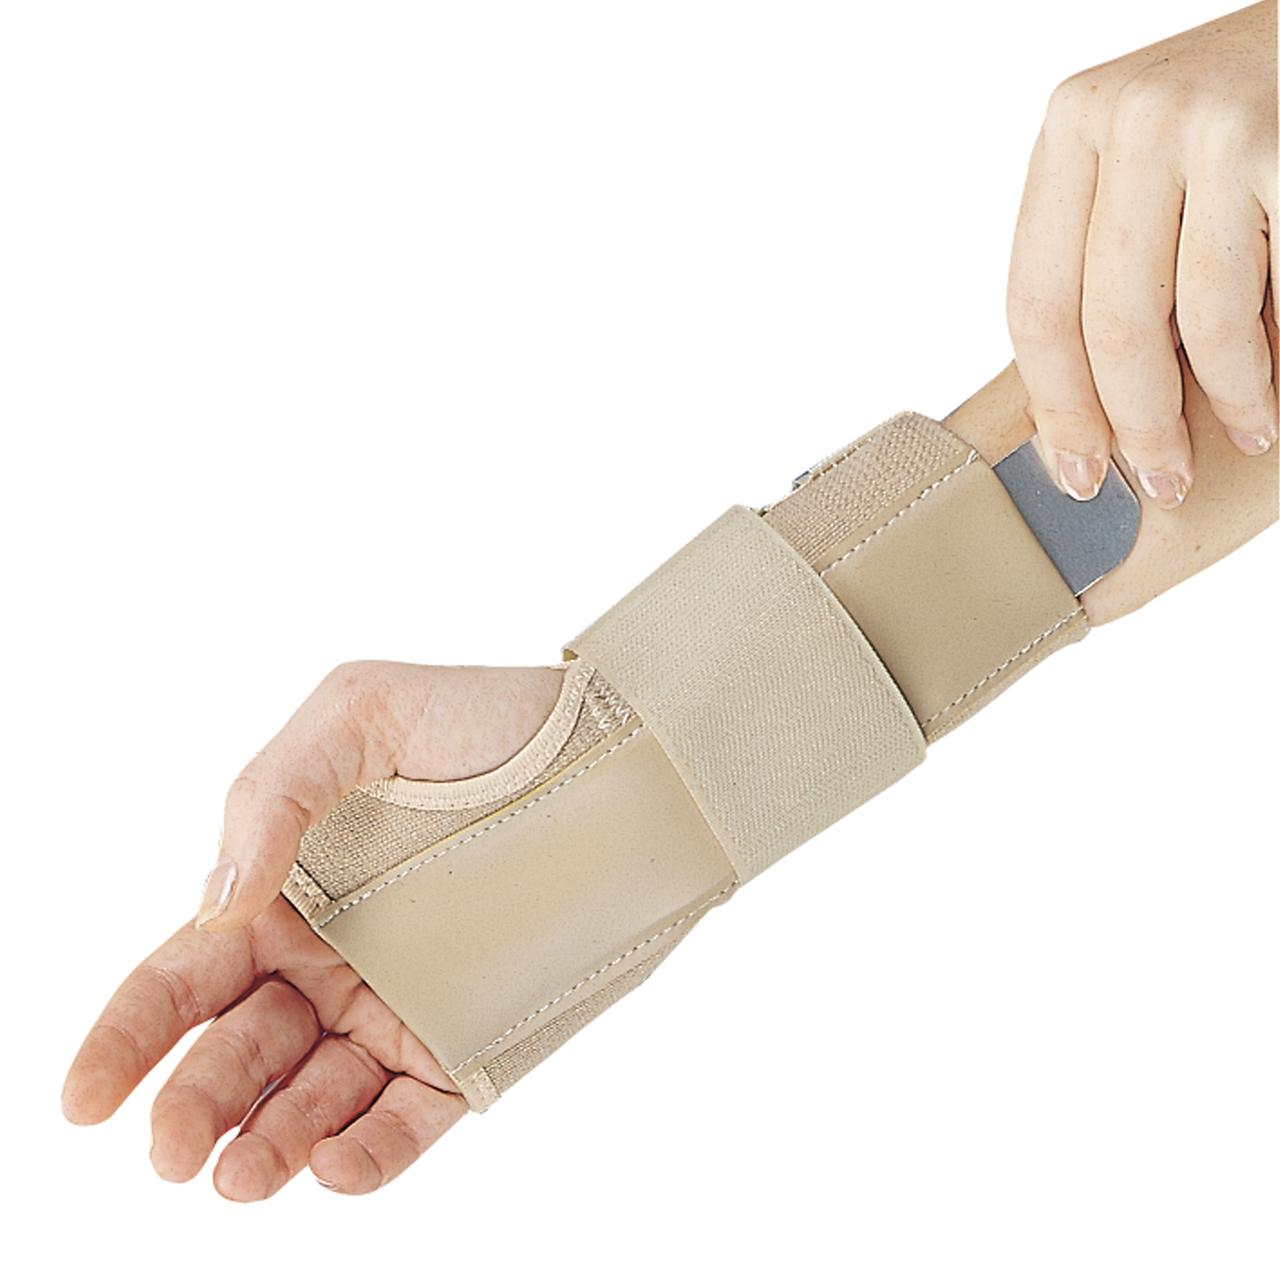 Бандаж на лучезапястный сустав Ortop WH-301, размер s